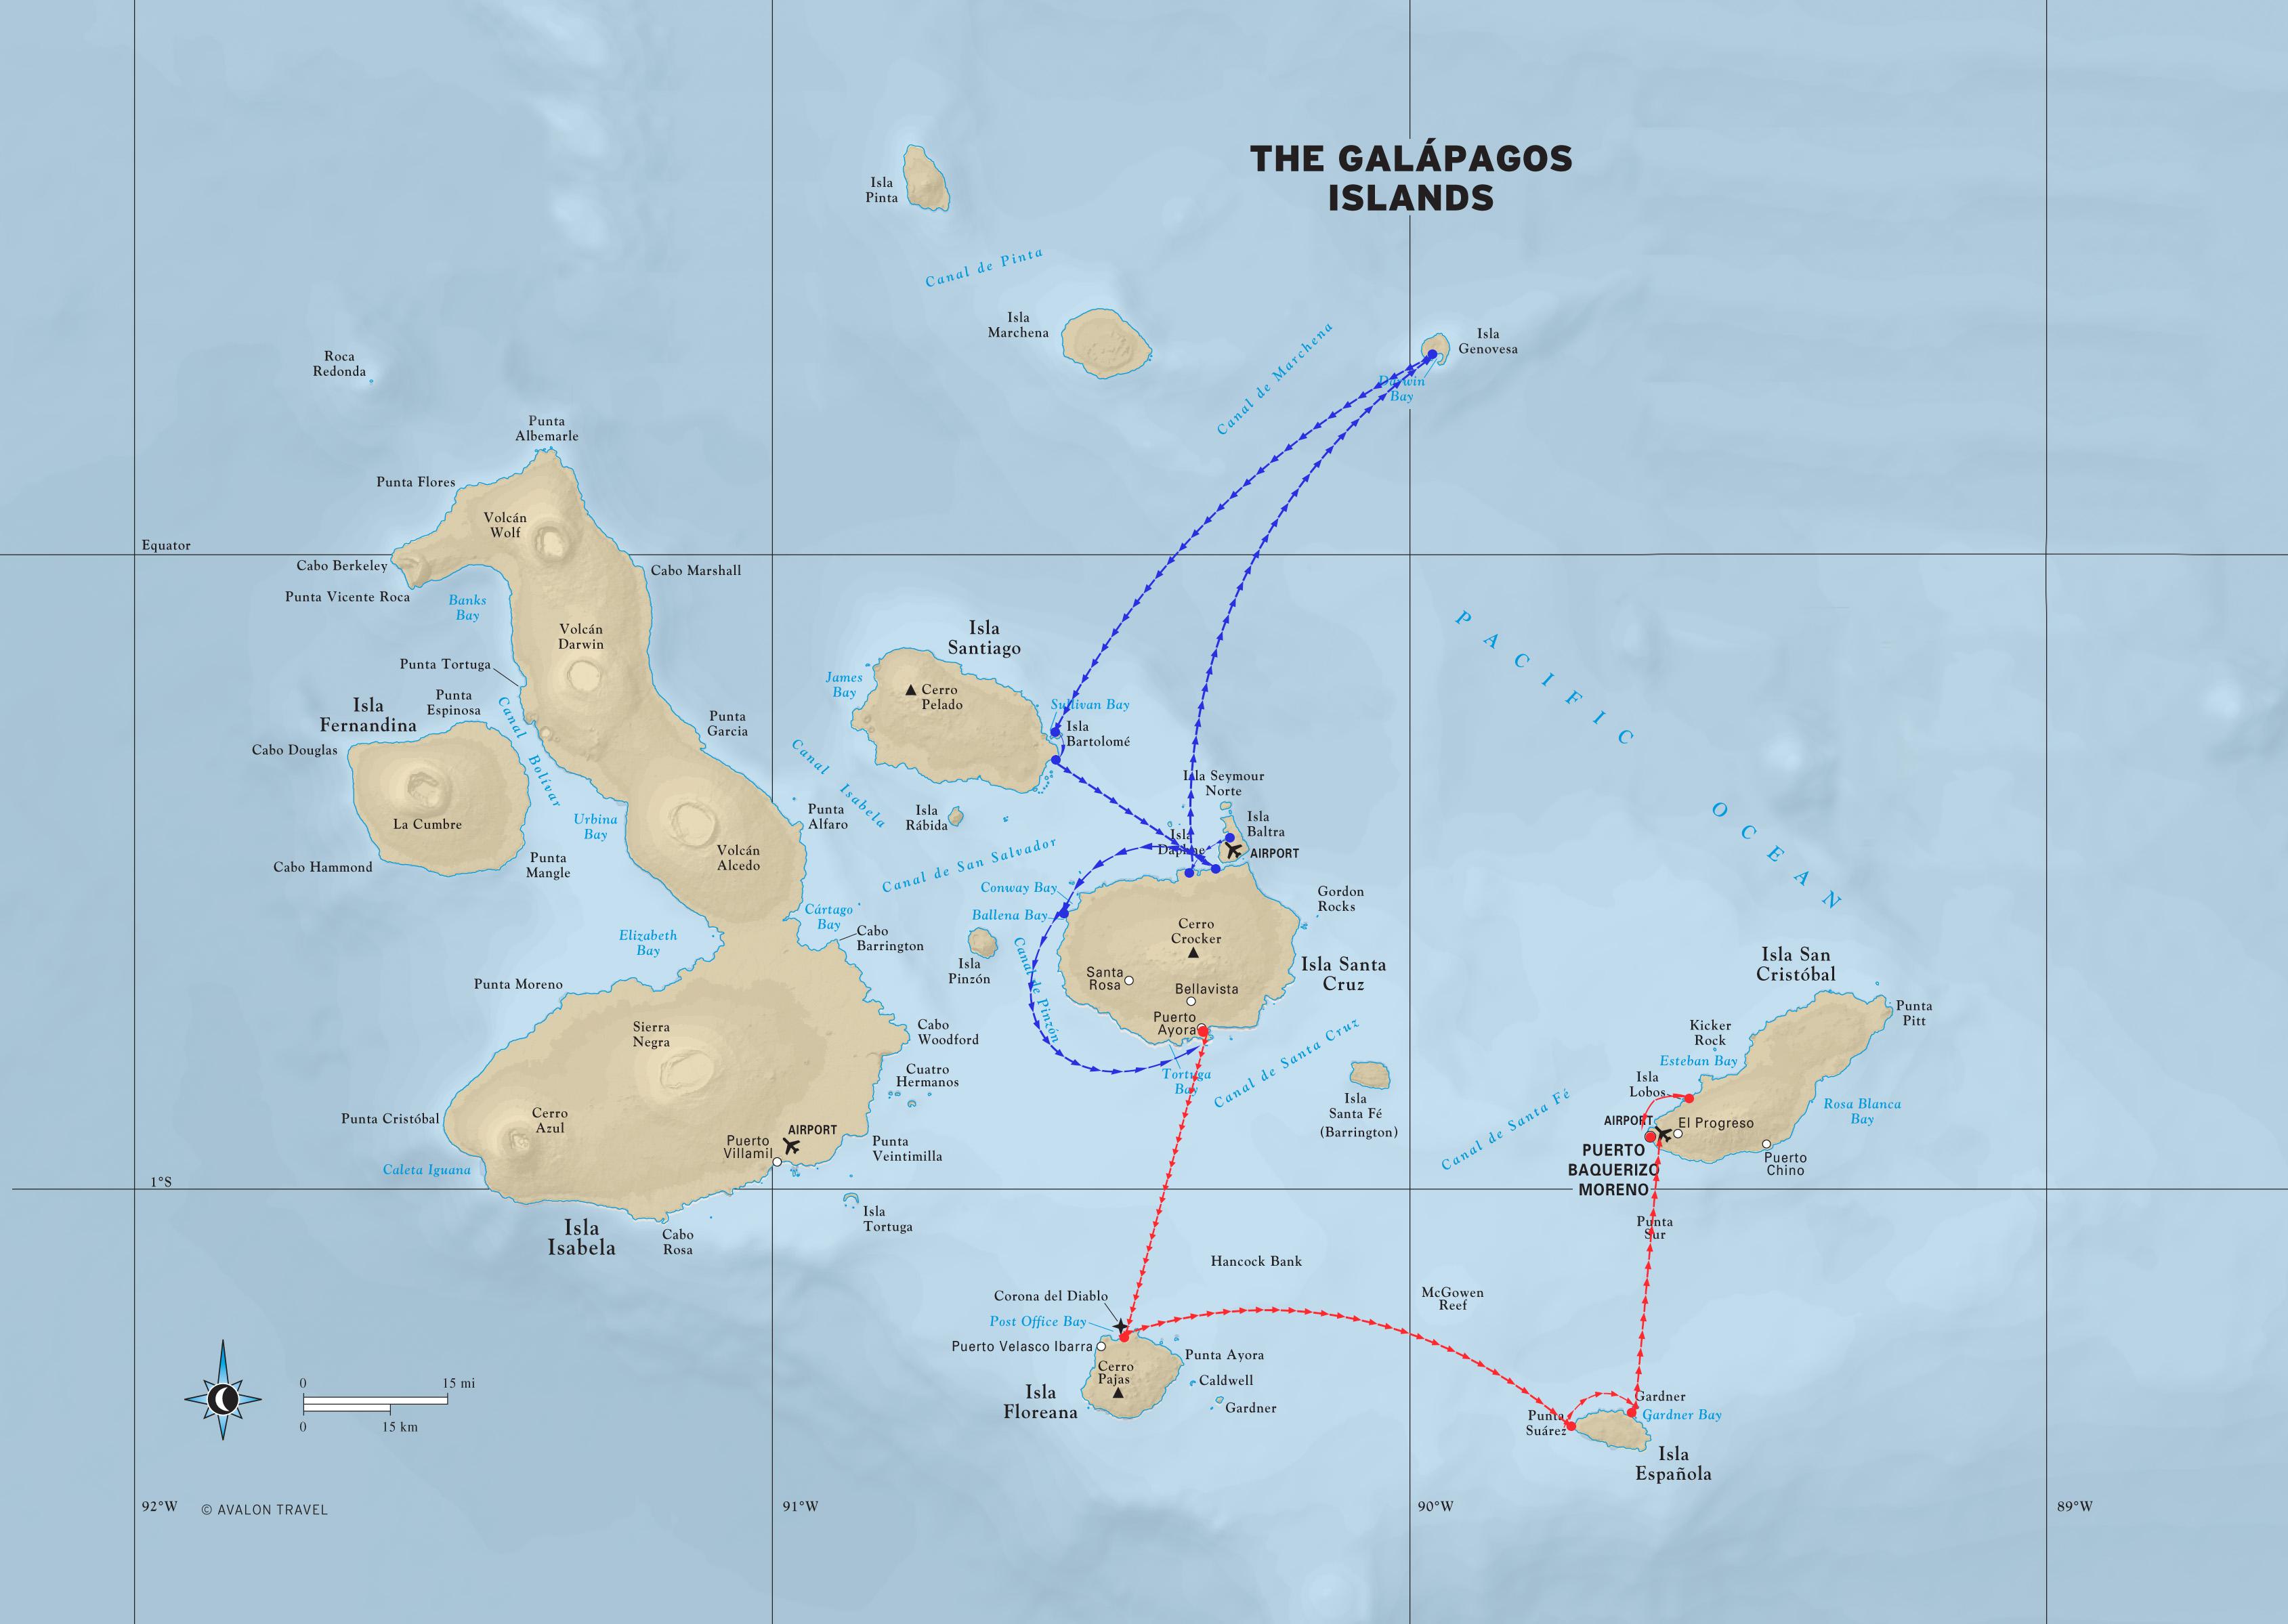 Galapagos Tours - Galapagos Islands Maps on puerto ayora, pinta island, amazon map, puerto baquerizo moreno, yucatan peninsula map, brazilian highlands map, cuba map, oman map, isabela island, bahamas map, lesser antilles map, ha long bay, genovesa island, puerto rico map, charles darwin research station, nameless island, greenland map, galapagos national park, cape horn map, strait of magellan map, patagonia map, japan map, darwin island, ecuador map, bay of fundy, pampas map, canada map, tierra del fuego map, pacific map, fernandina island, baltra island, lake titicaca map, floreana island, falklands map,